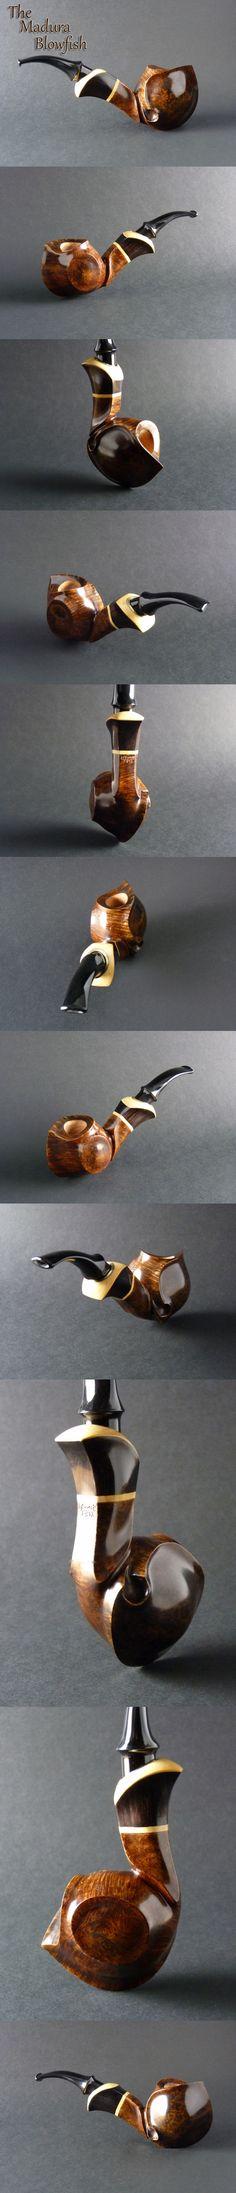 The Madura Blowfish, by Stephen Downie. www.downiepipes.com